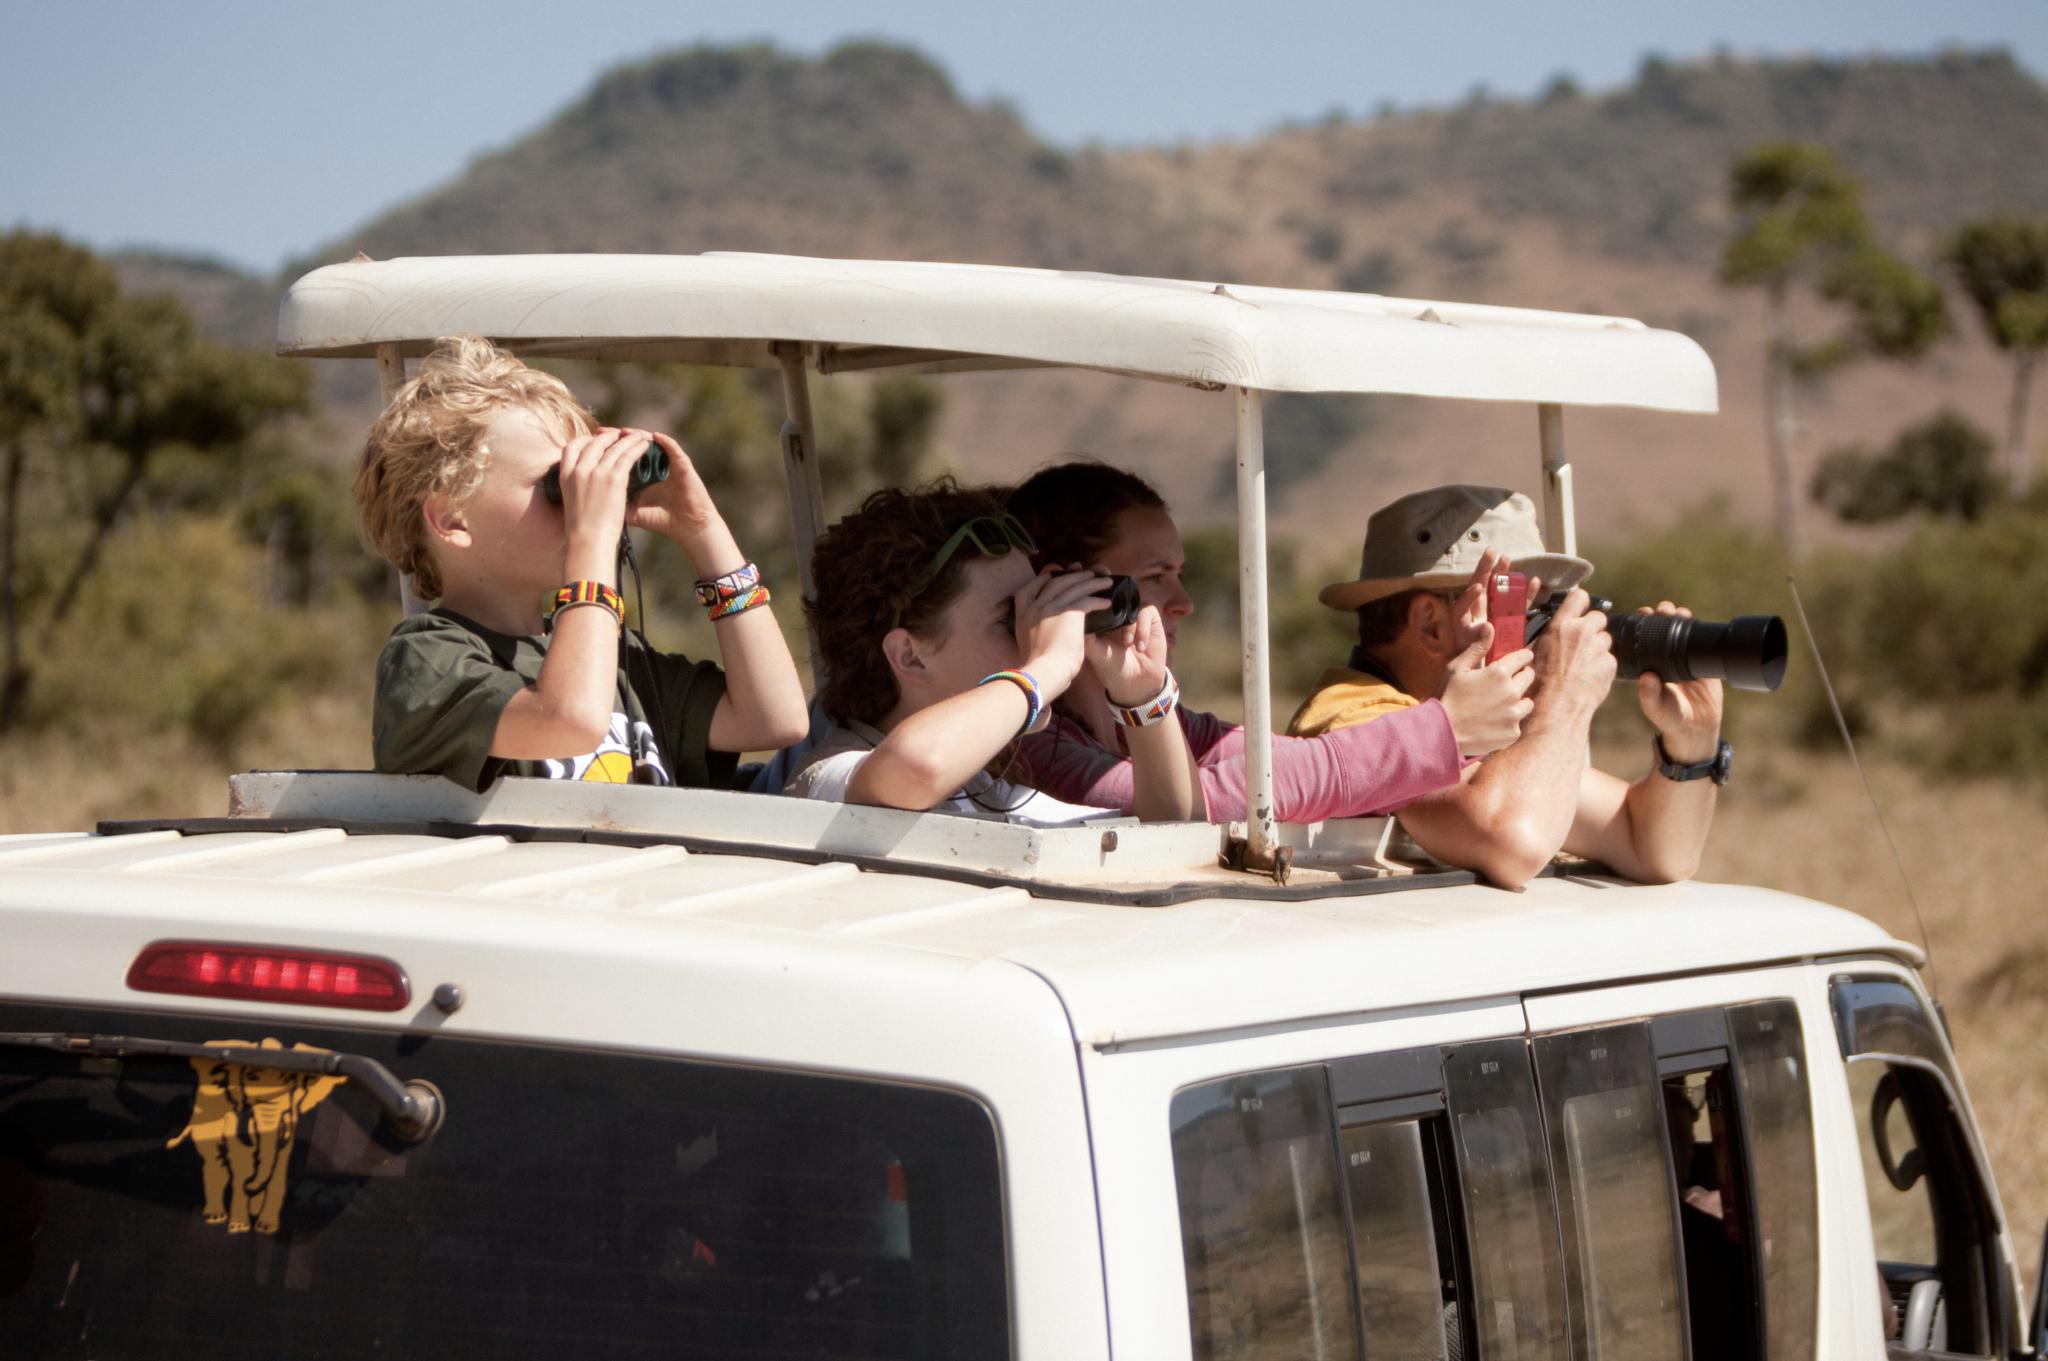 Best wildlife Photographer in Kenya, professional wildlife photographer in Kenya